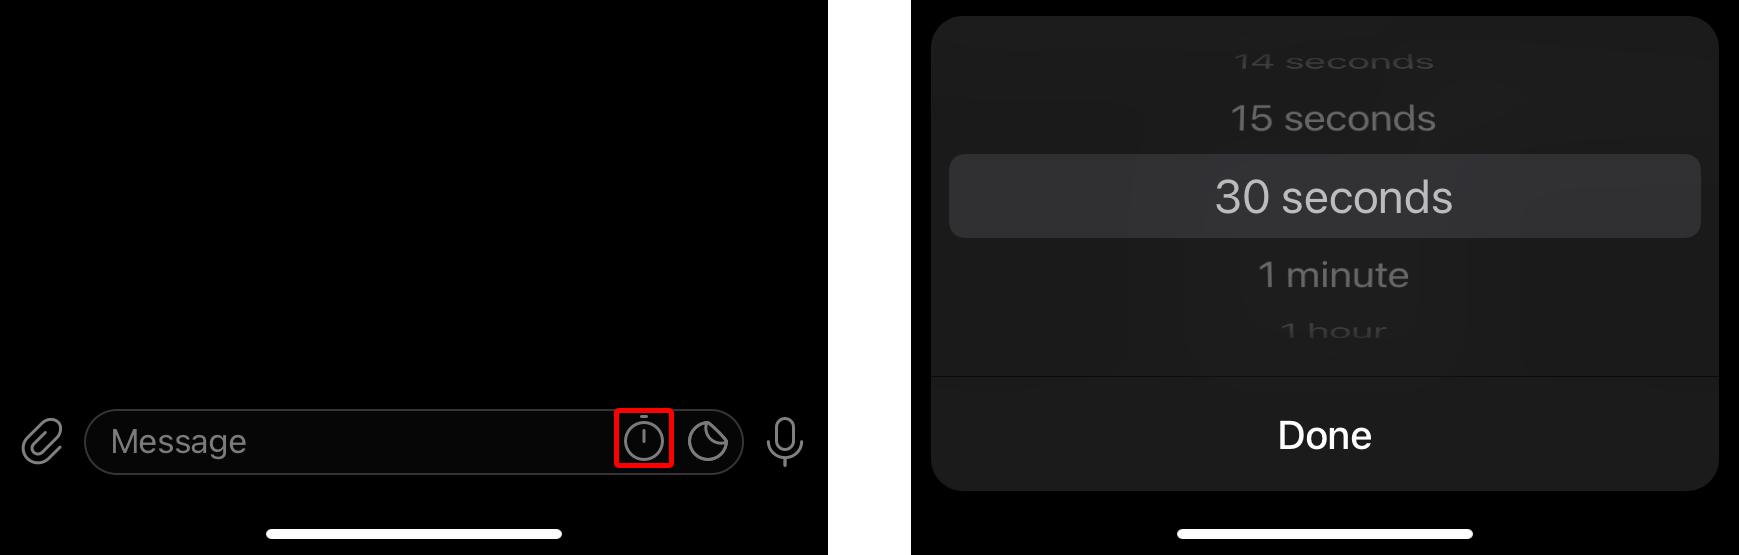 Telegramのシークレットチャットでメッセージを自動削除するタイマーを設定する